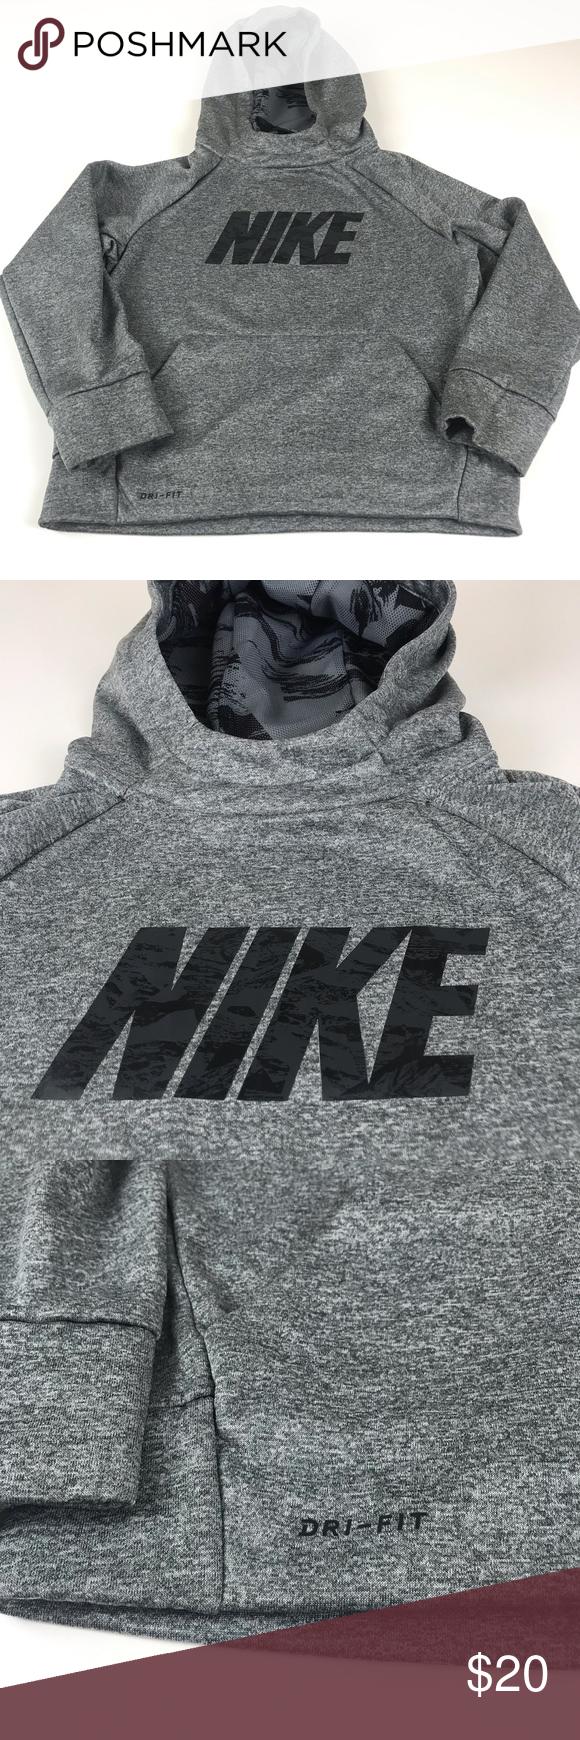 Nike Therma Colorblock Graphic Camo Hoodie Sz S Hoodies Camo Hoodie Sweatshirt Jacket [ 1740 x 580 Pixel ]